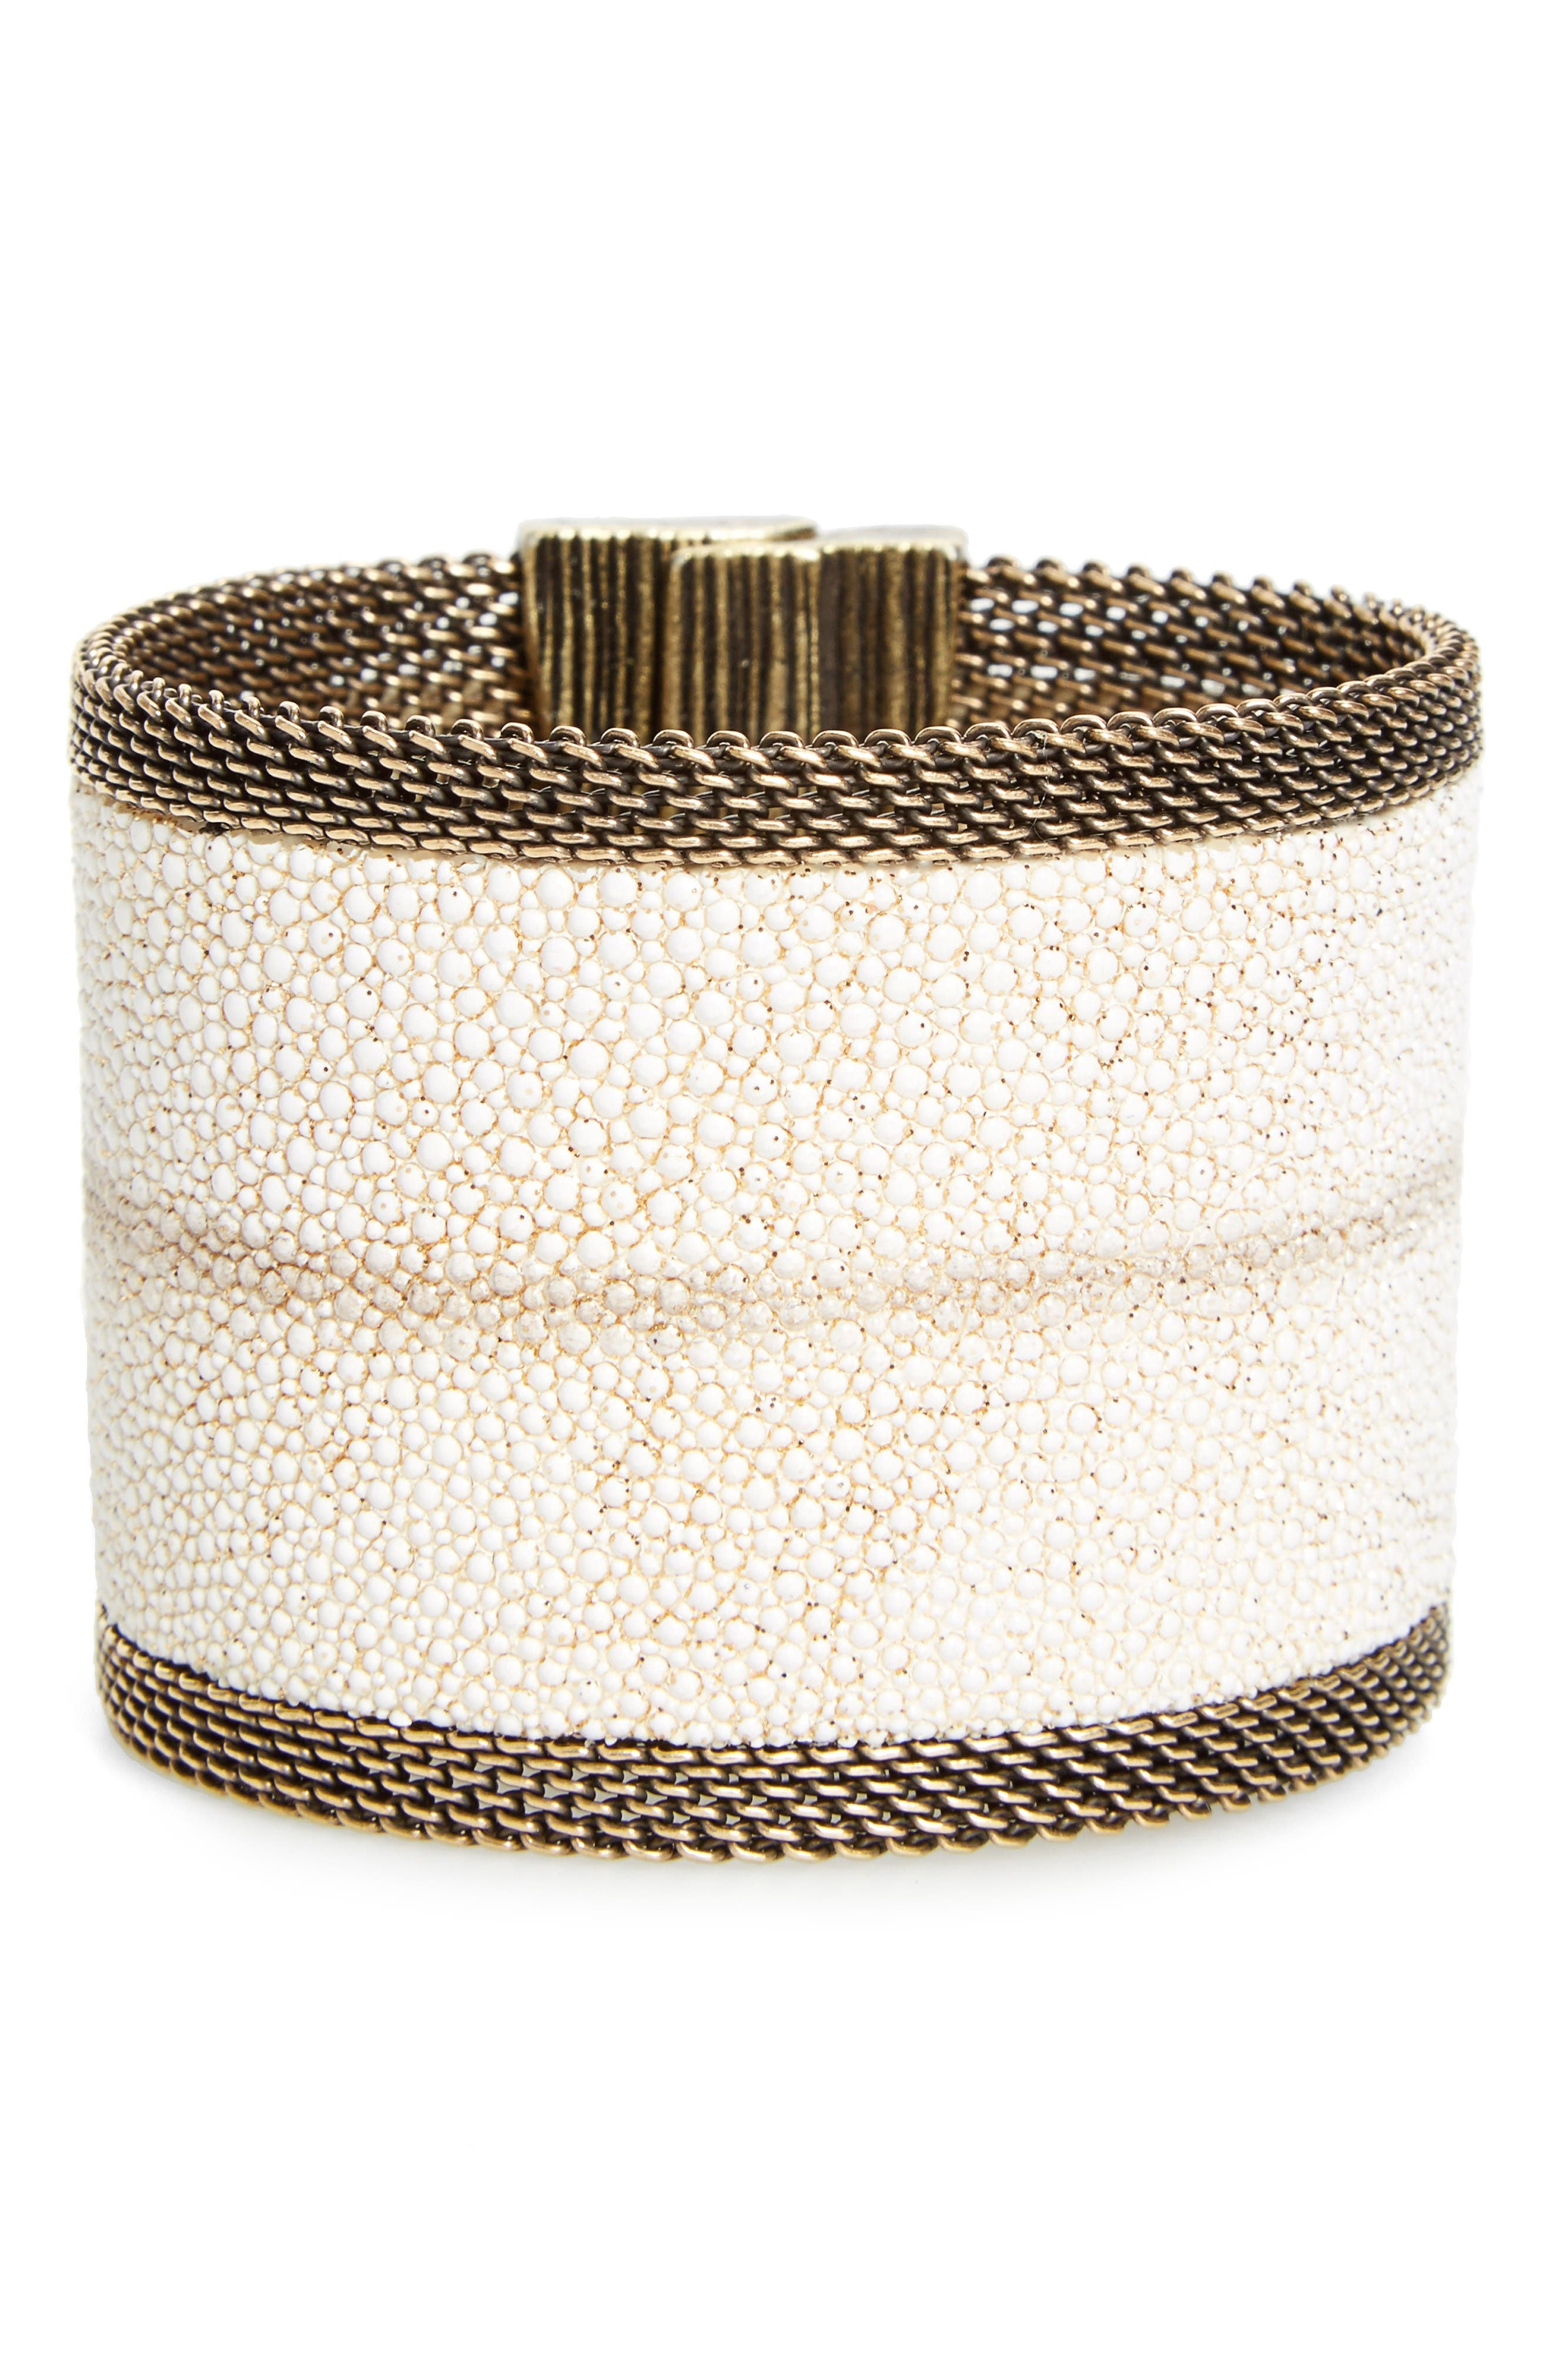 CYNTHIA DESSER Genuine Stingray Skin Bracelet